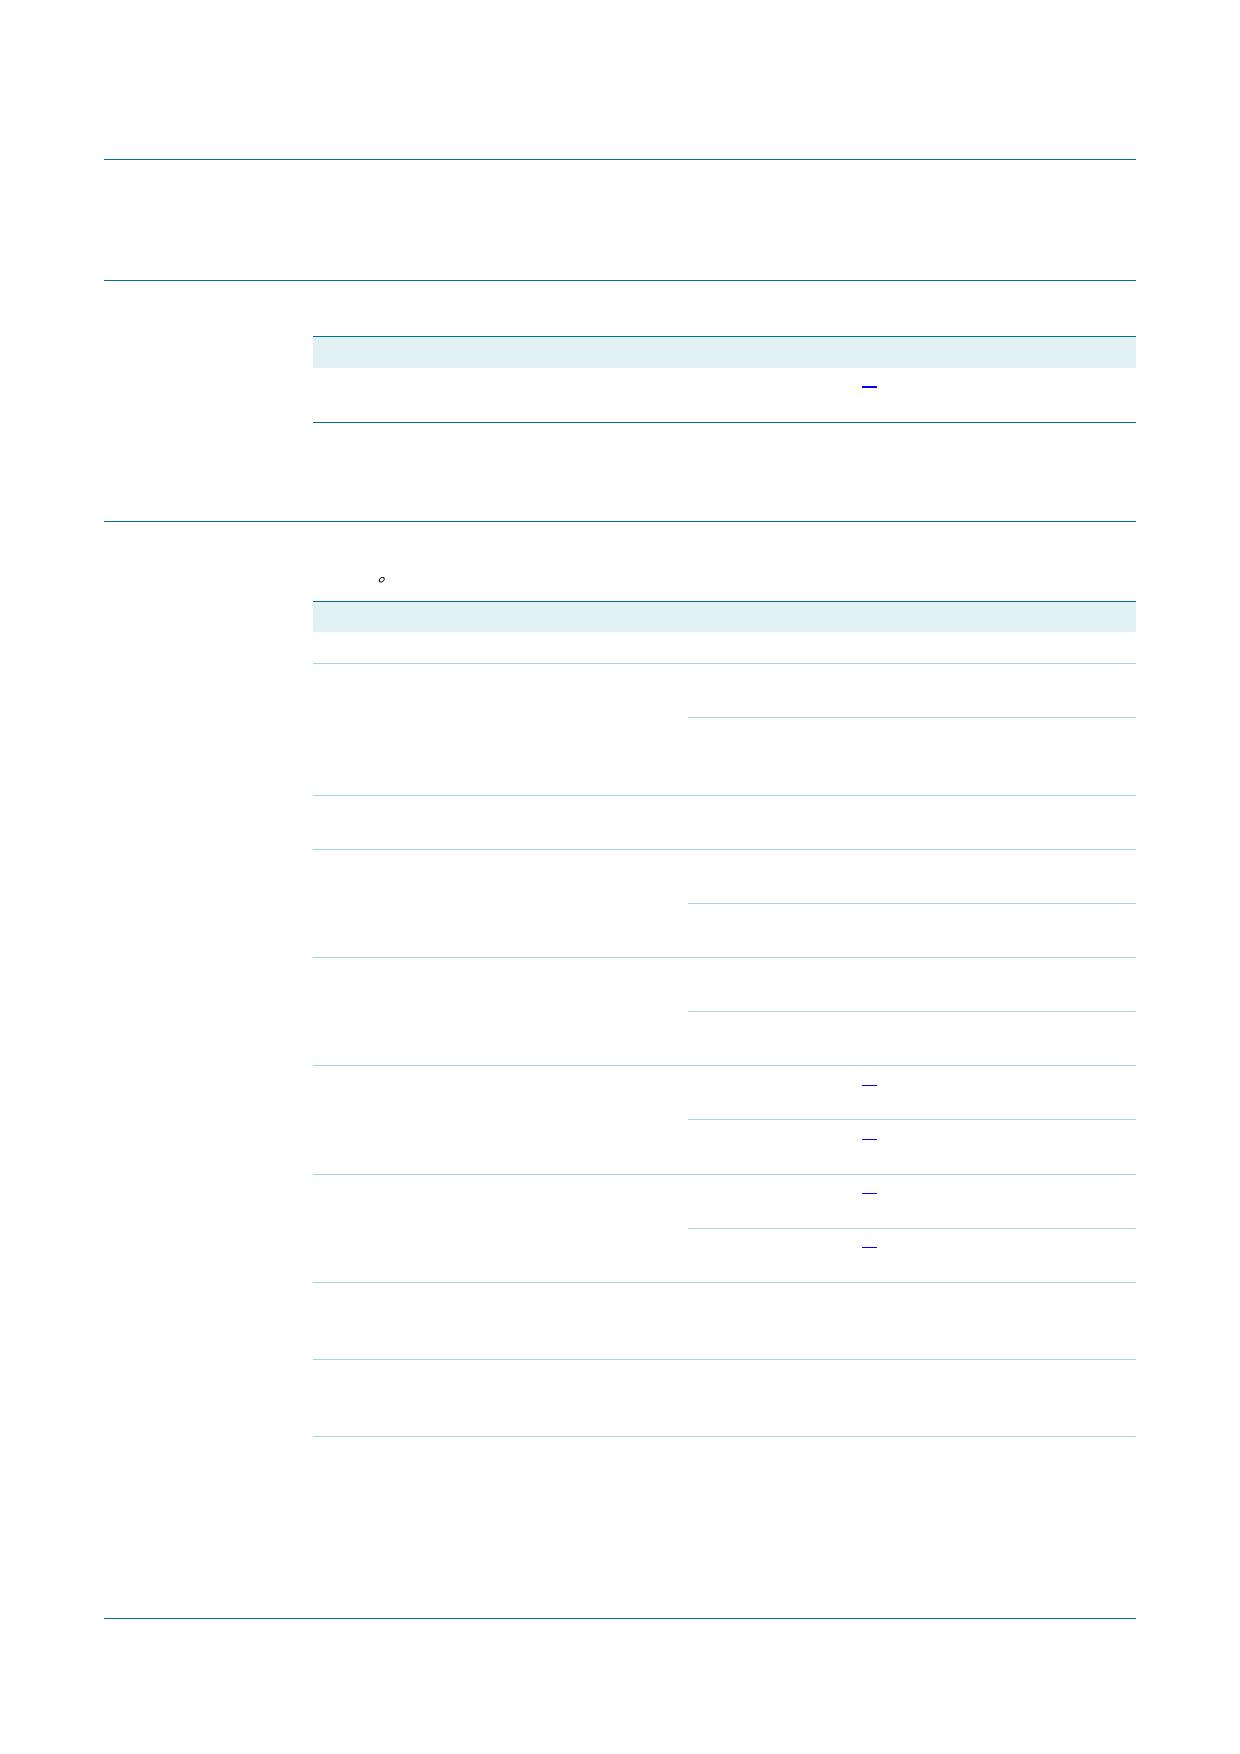 BCV61 pdf, 電子部品, 半導体, ピン配列